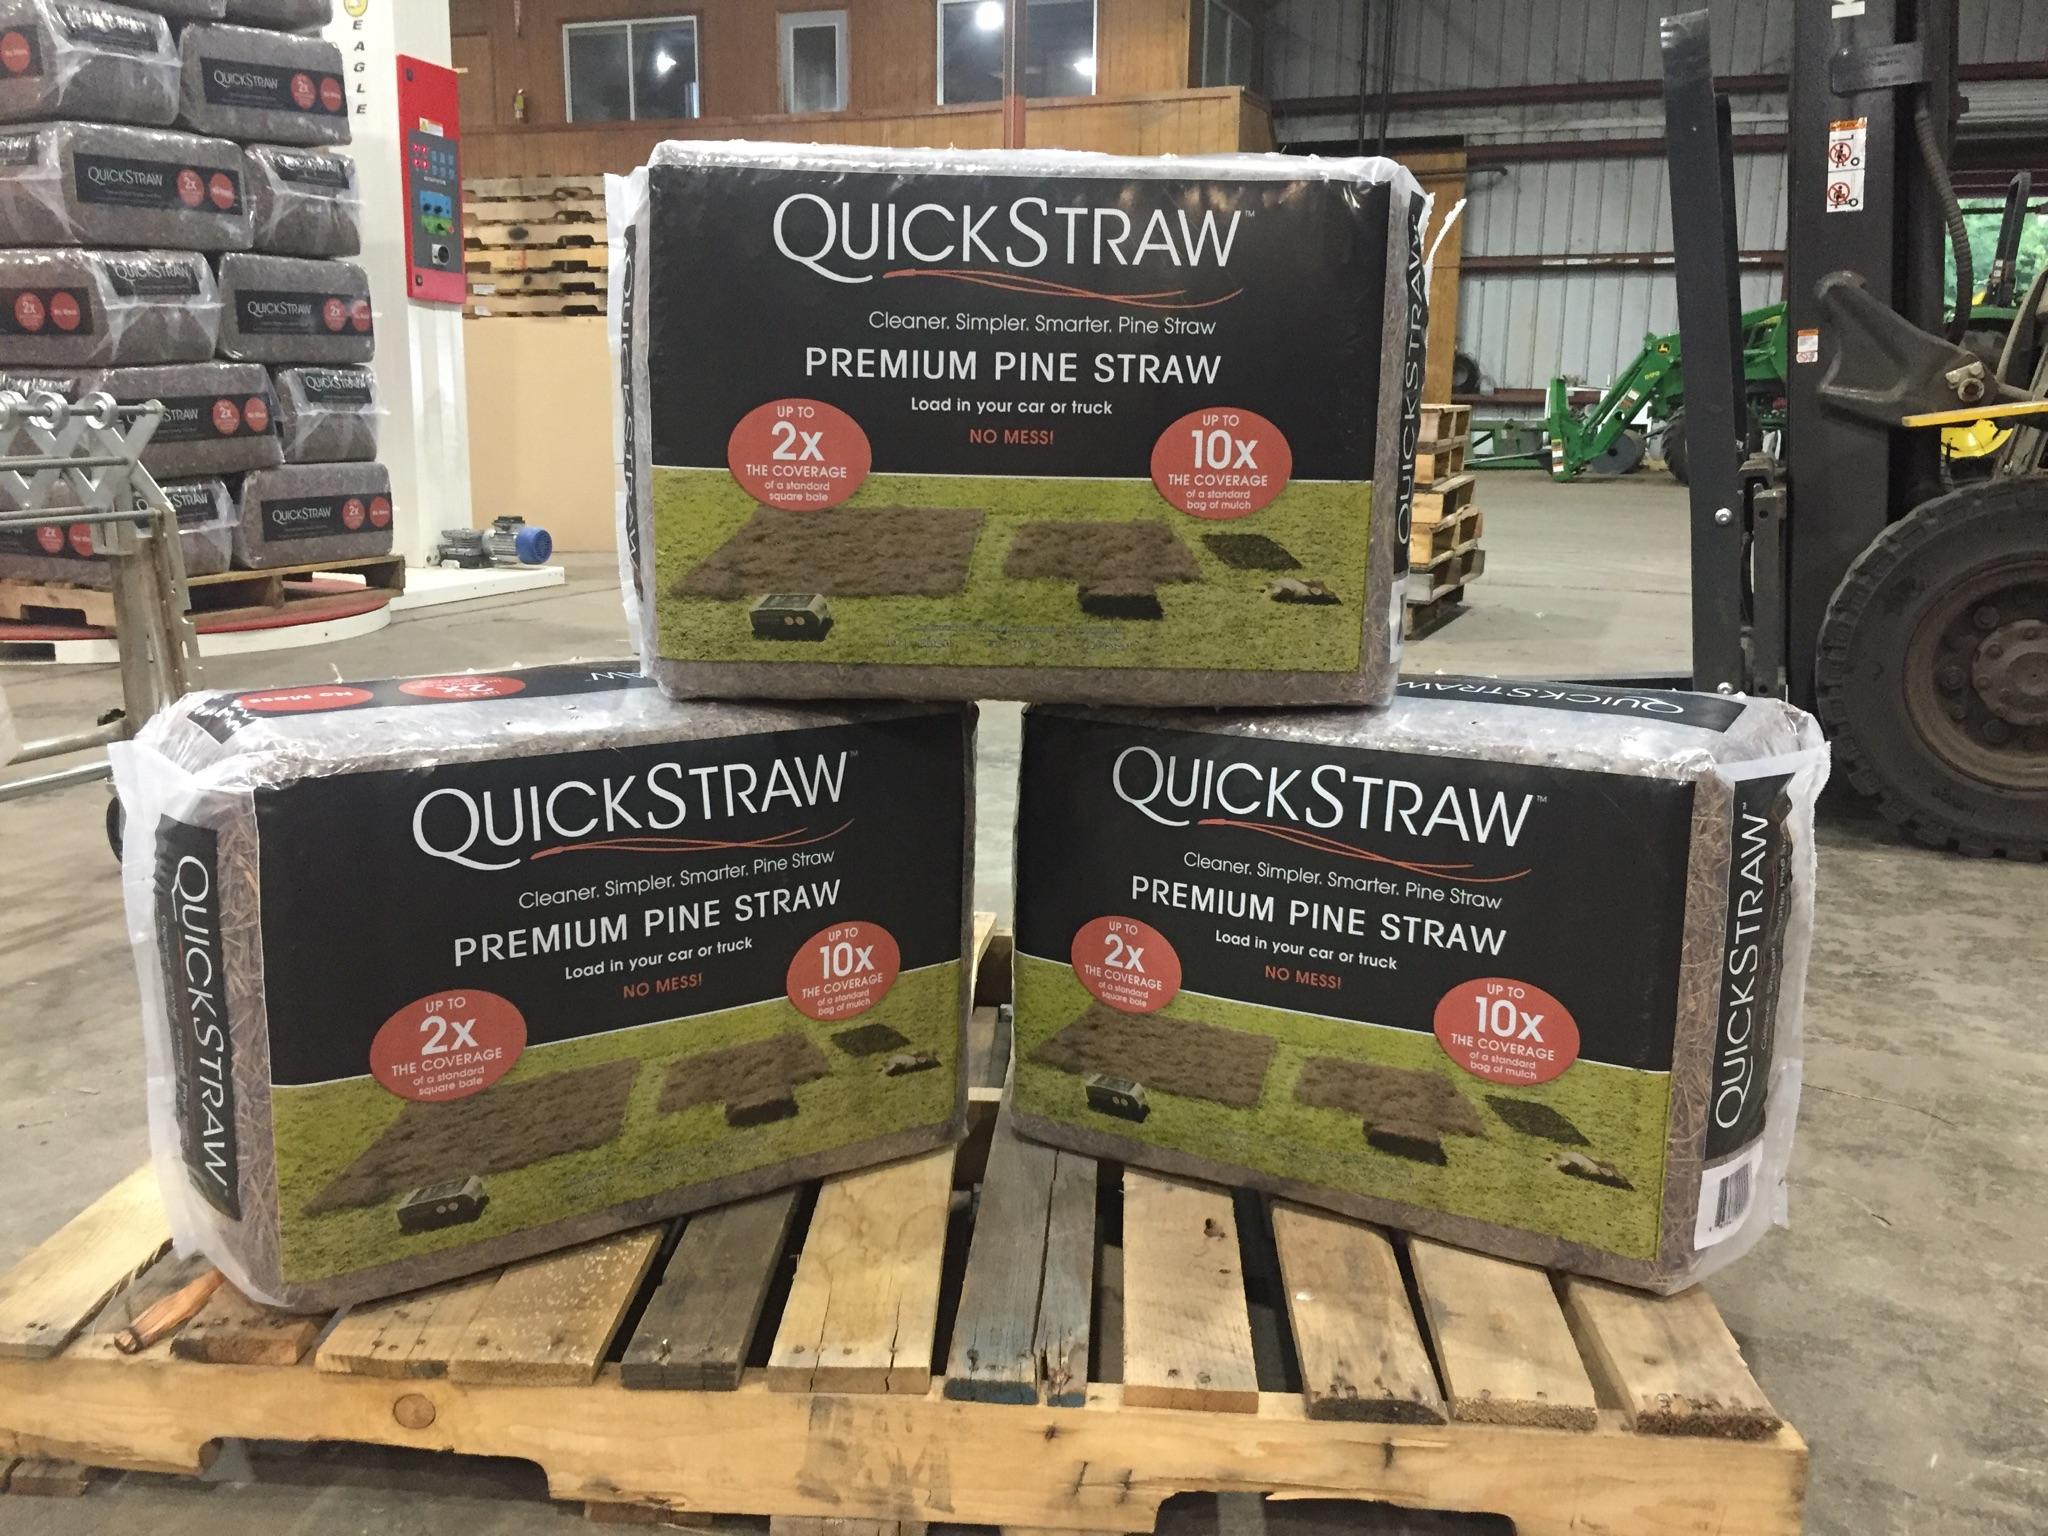 Quickstraw